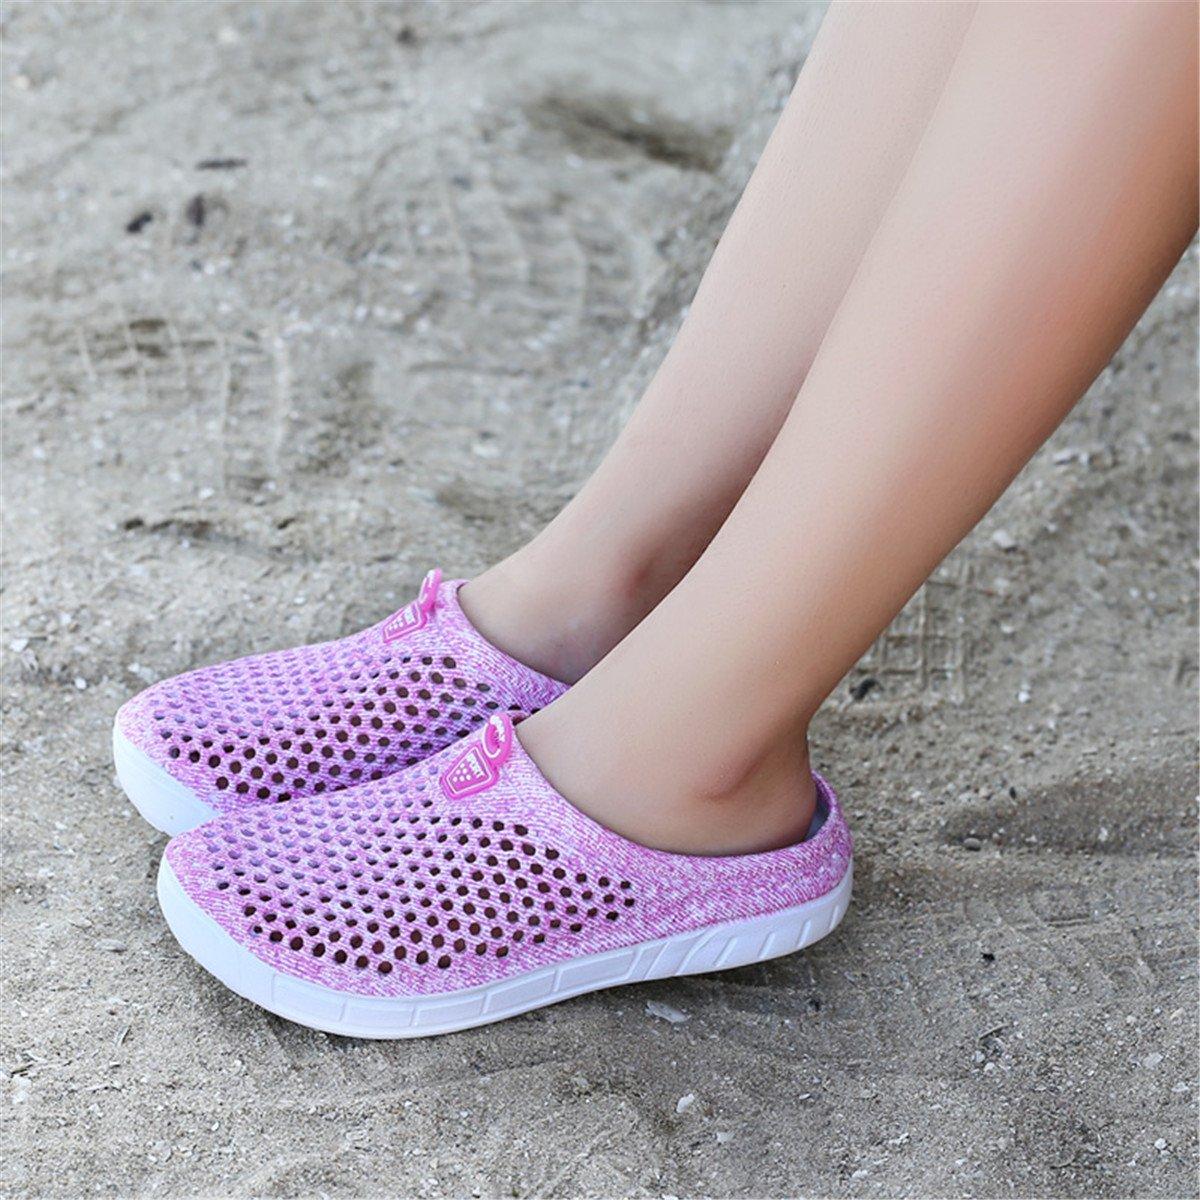 Ginjang Women's Garden Clogs Shoes Slip-on Slippers Sandals(39/Pink) by Ginjang (Image #6)